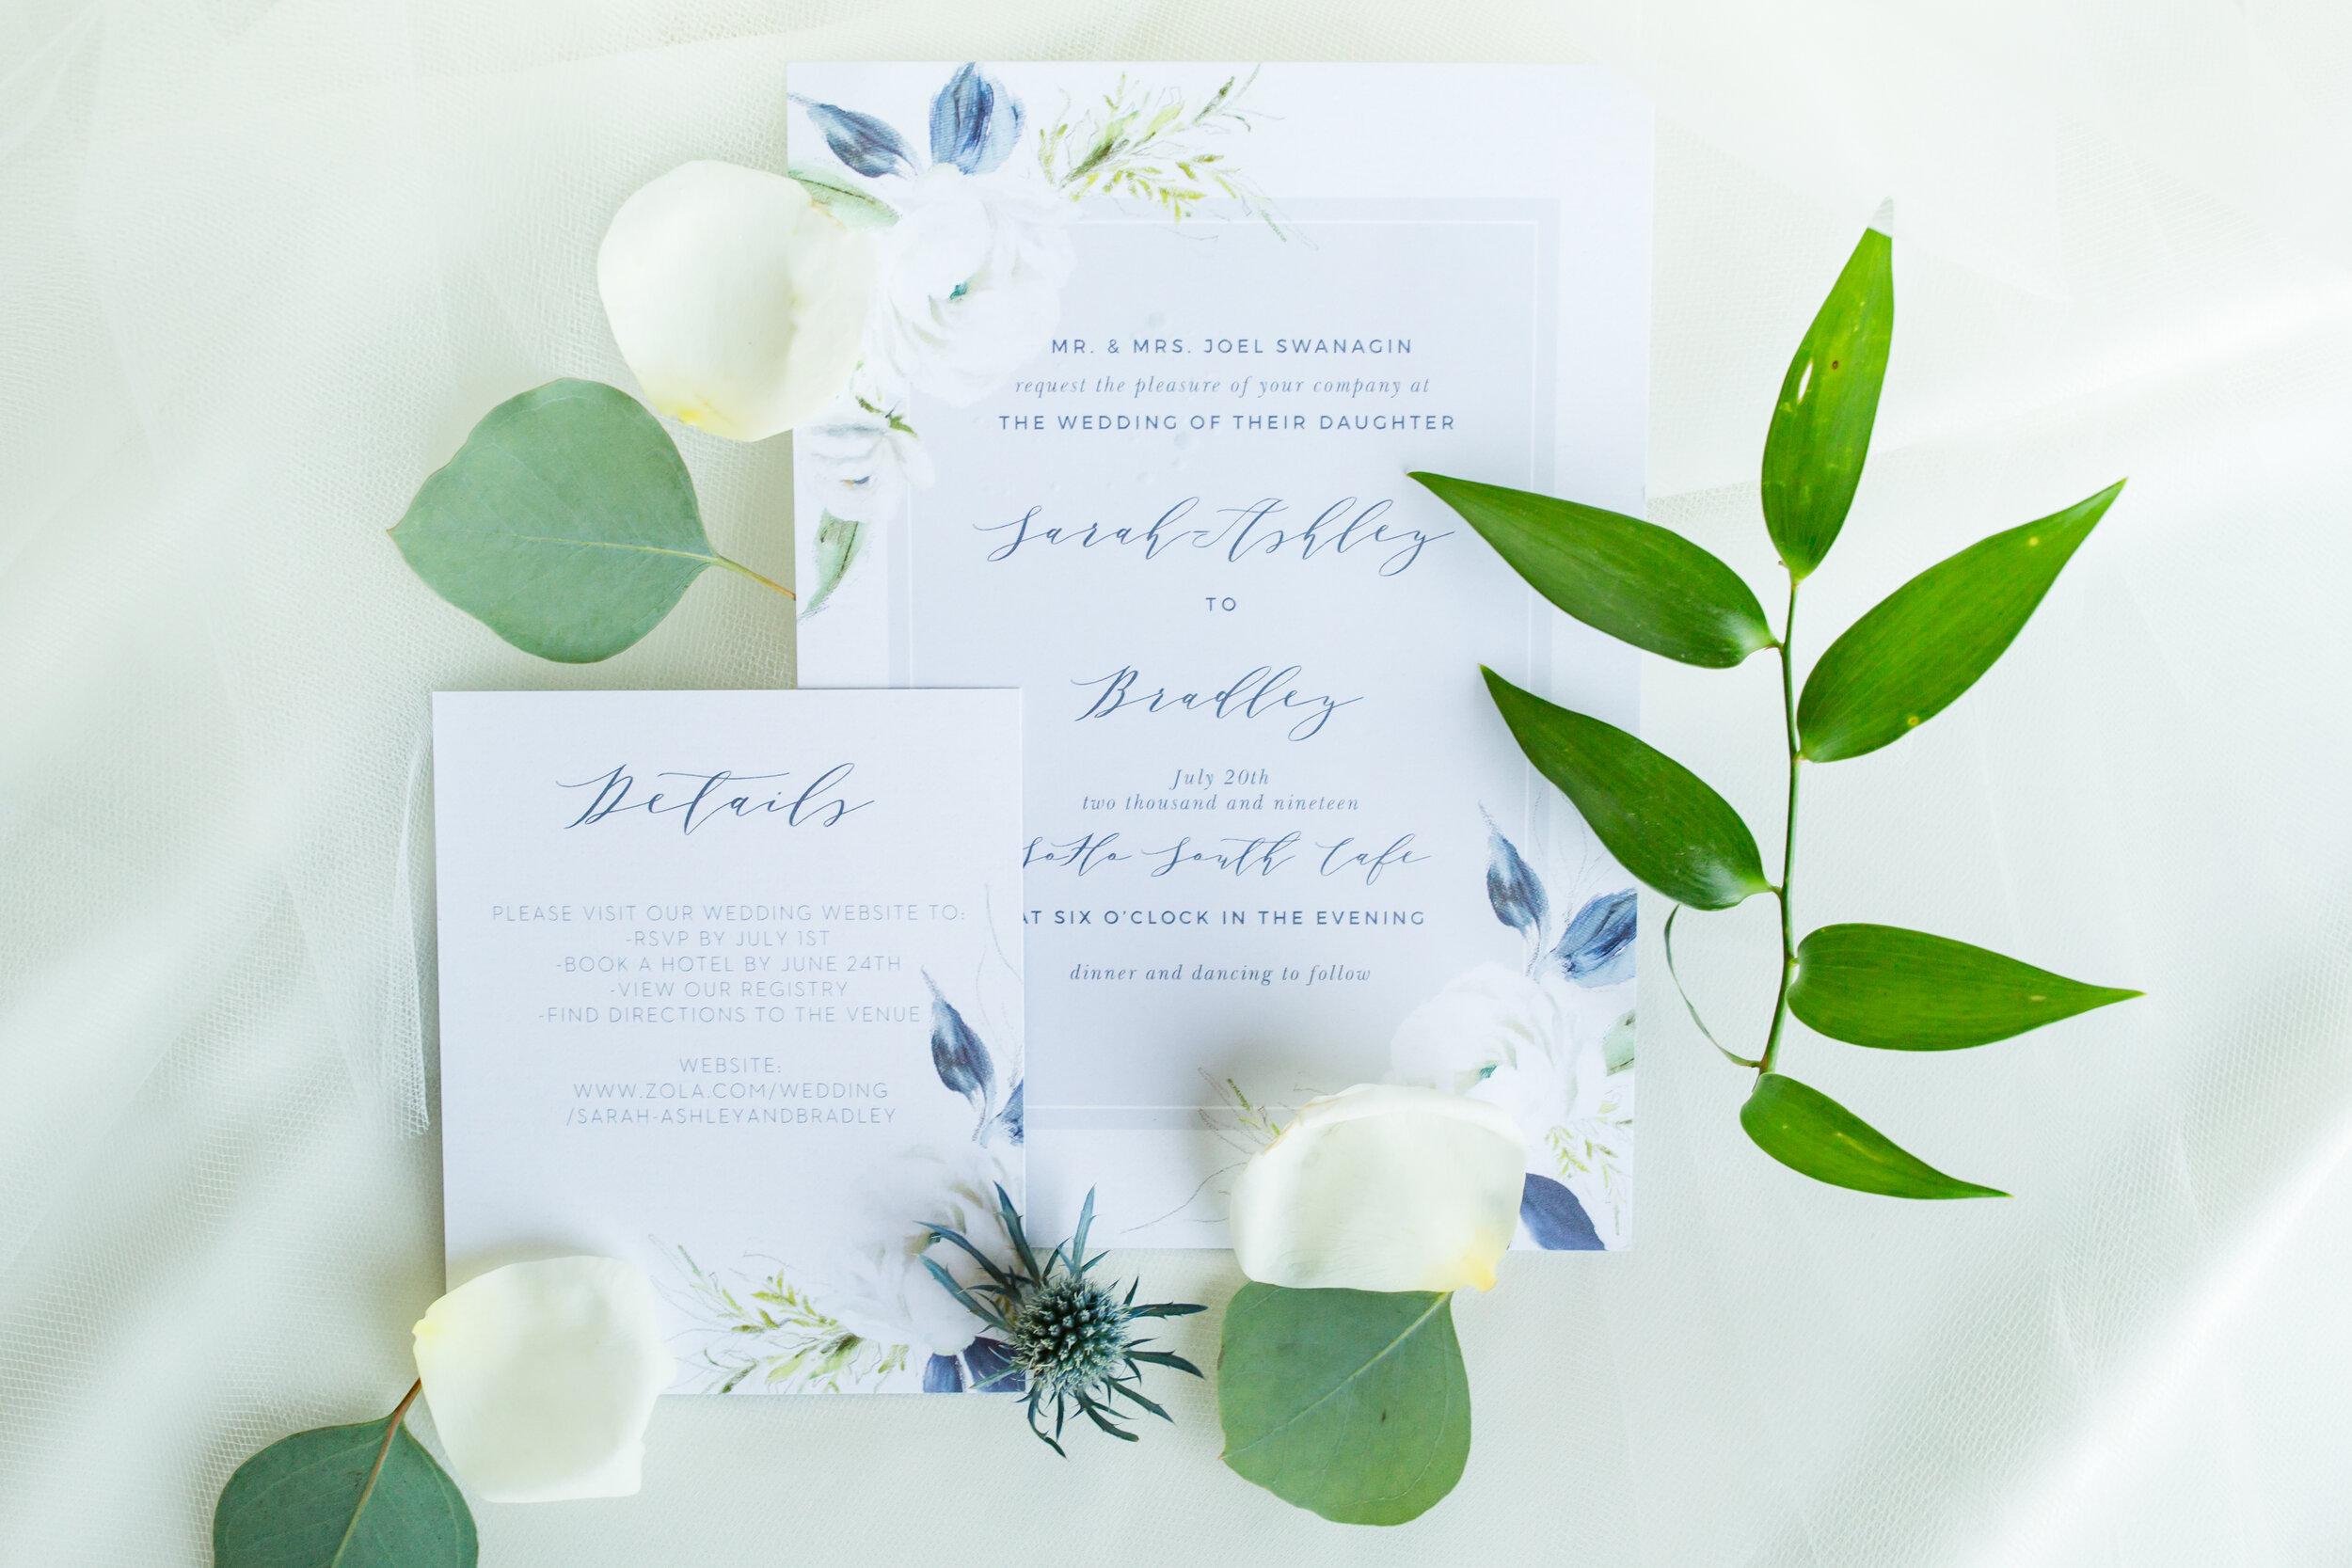 ivory-and-beau-bride-wedding-dresses-bridal-boutique-bridal-shop-savannah-wedding-shop-DGP_SohoSouthCafe_Swanagin-Mullis-14.JPG